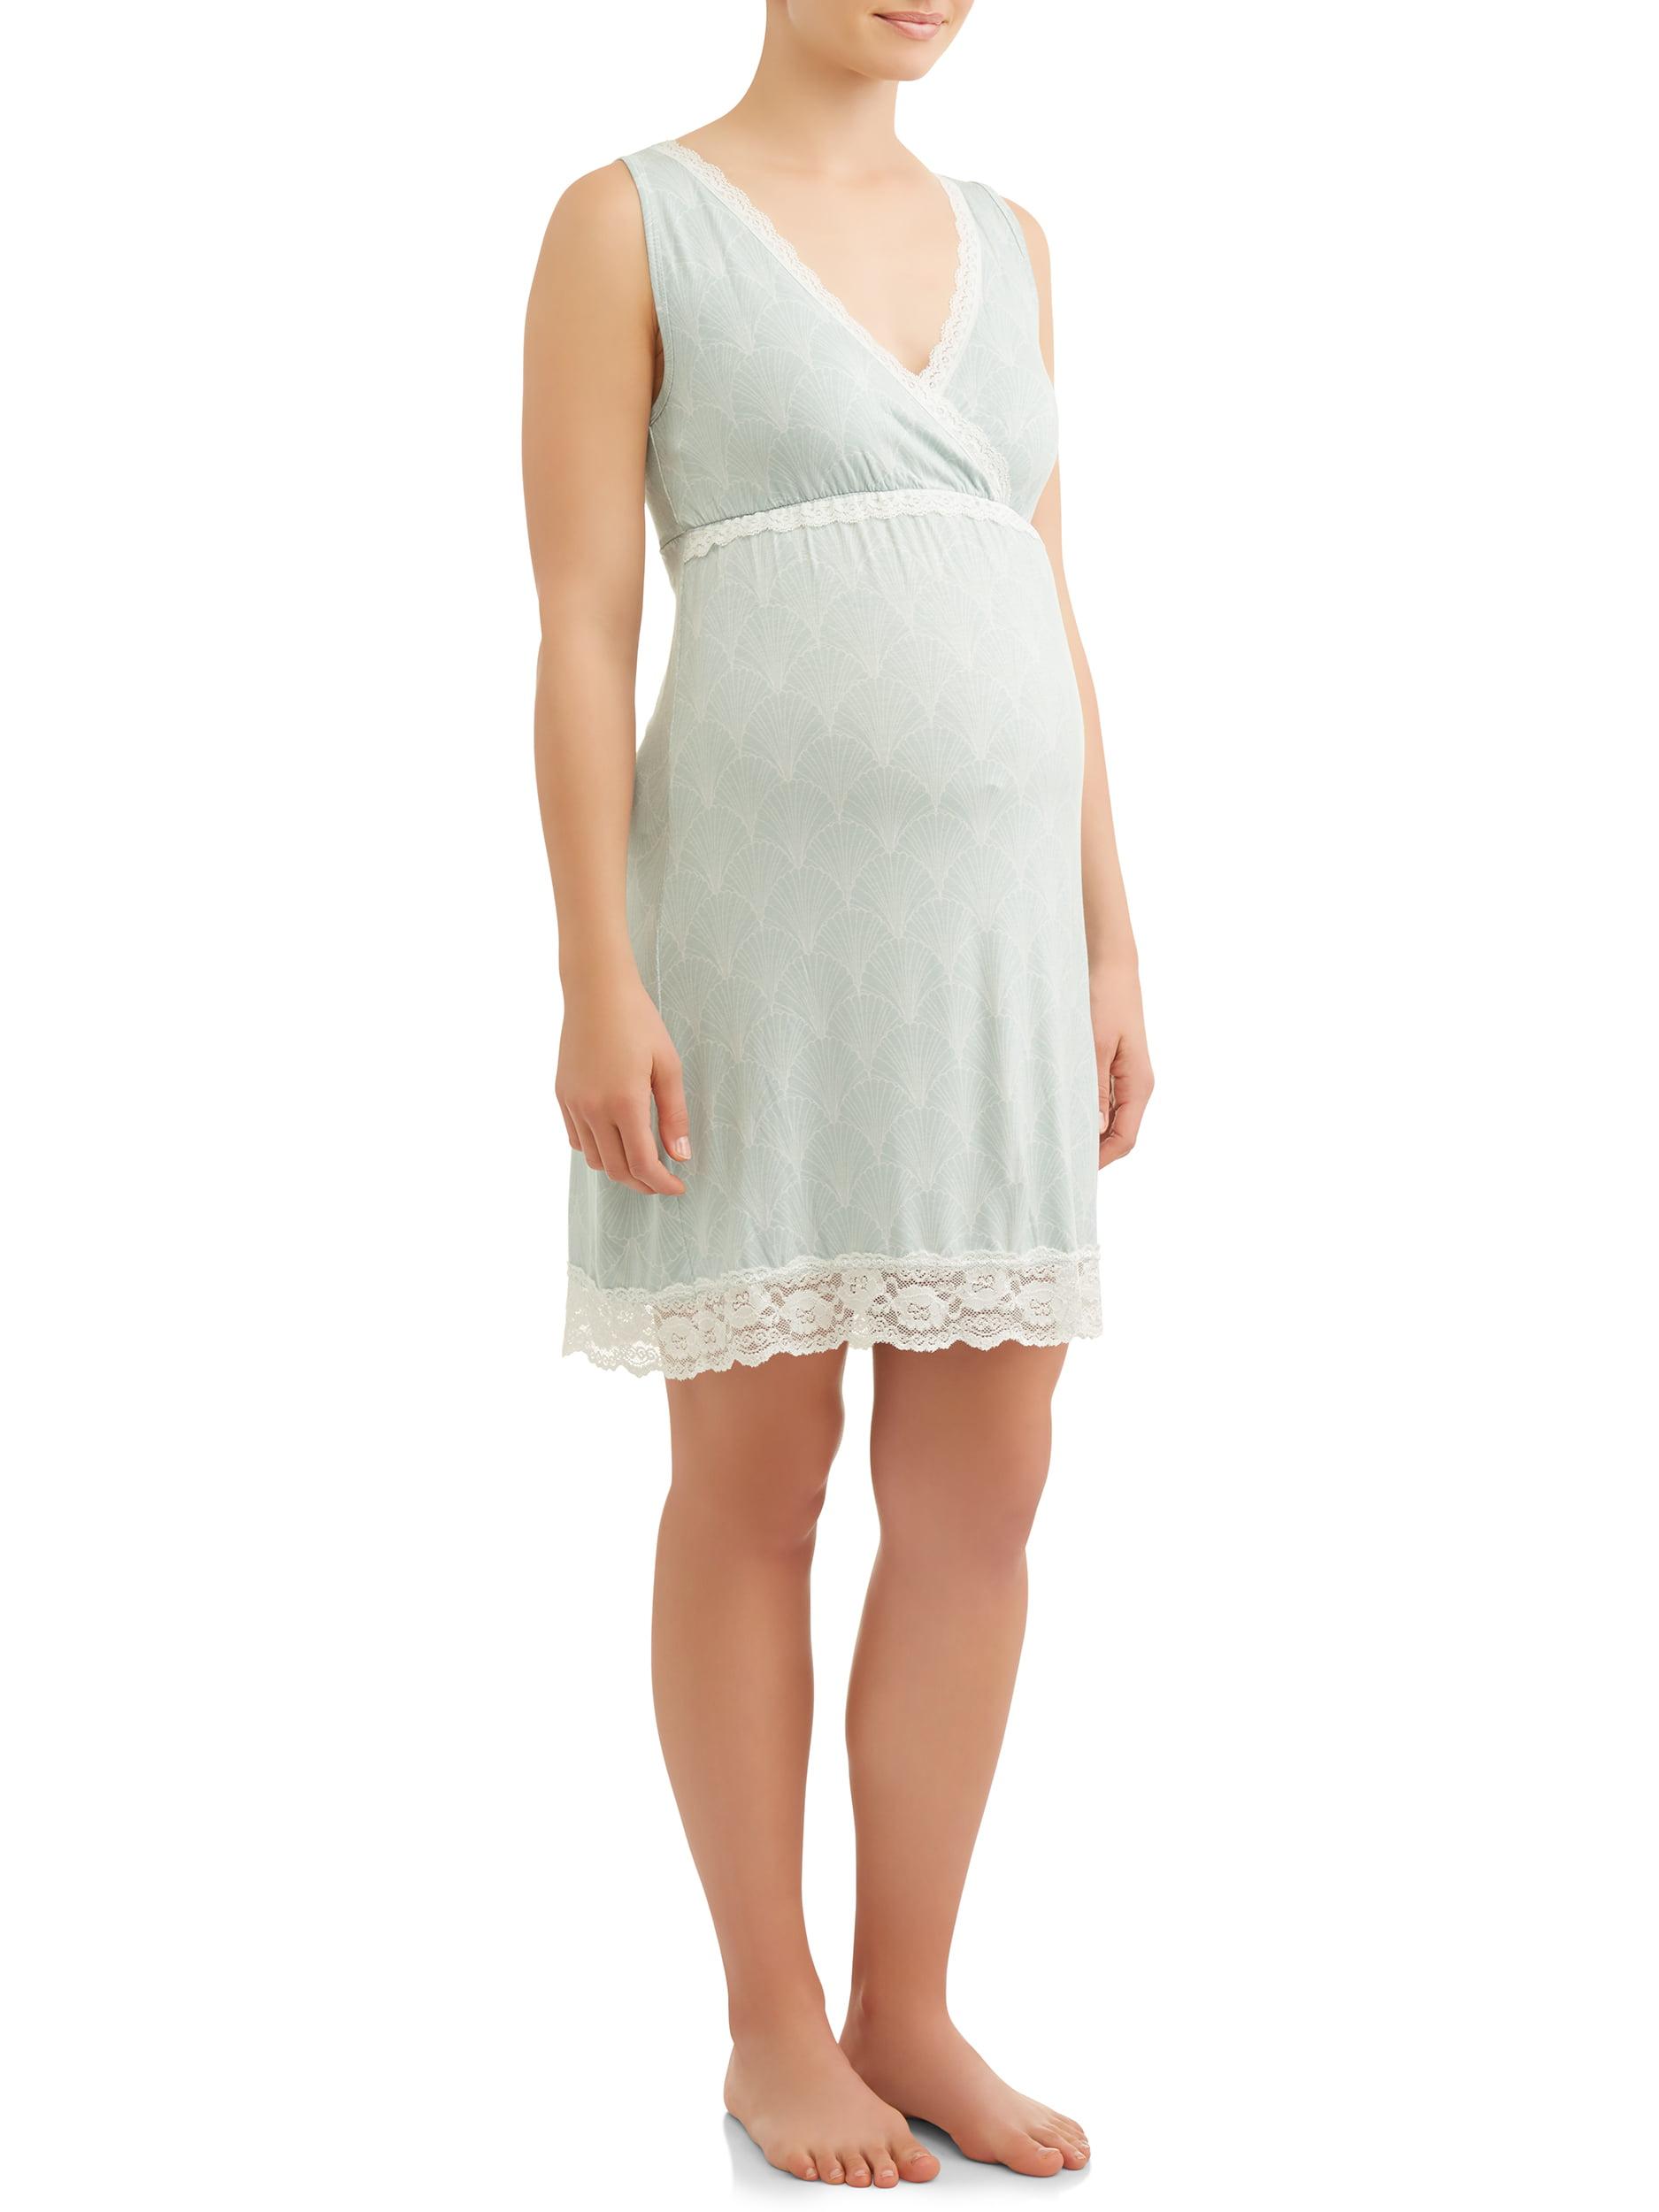 Maternity Nursing Full Coverage Sleep Chemise